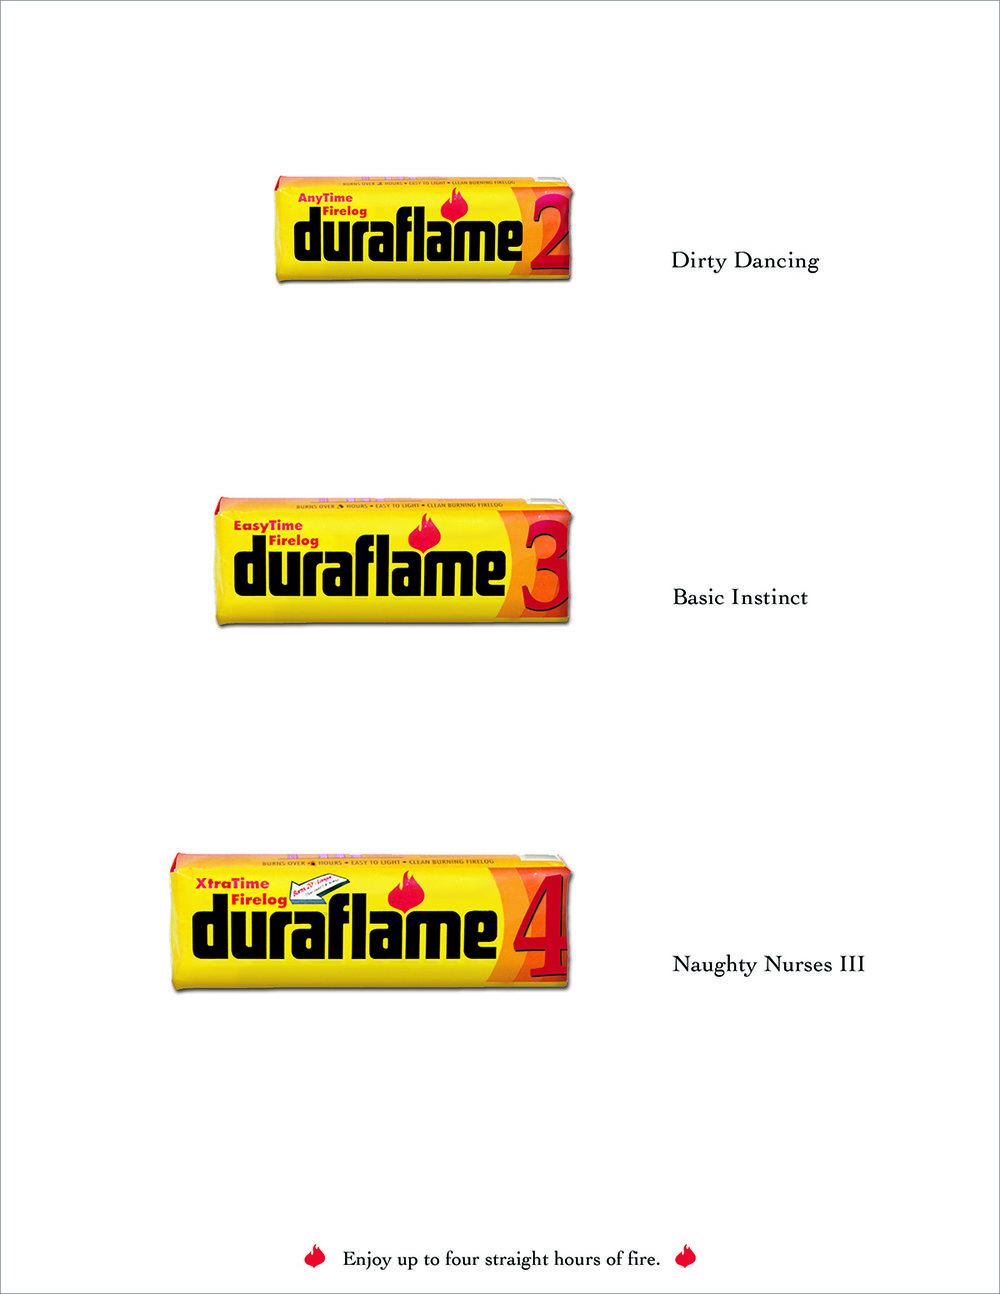 duraflame_movies.jpg